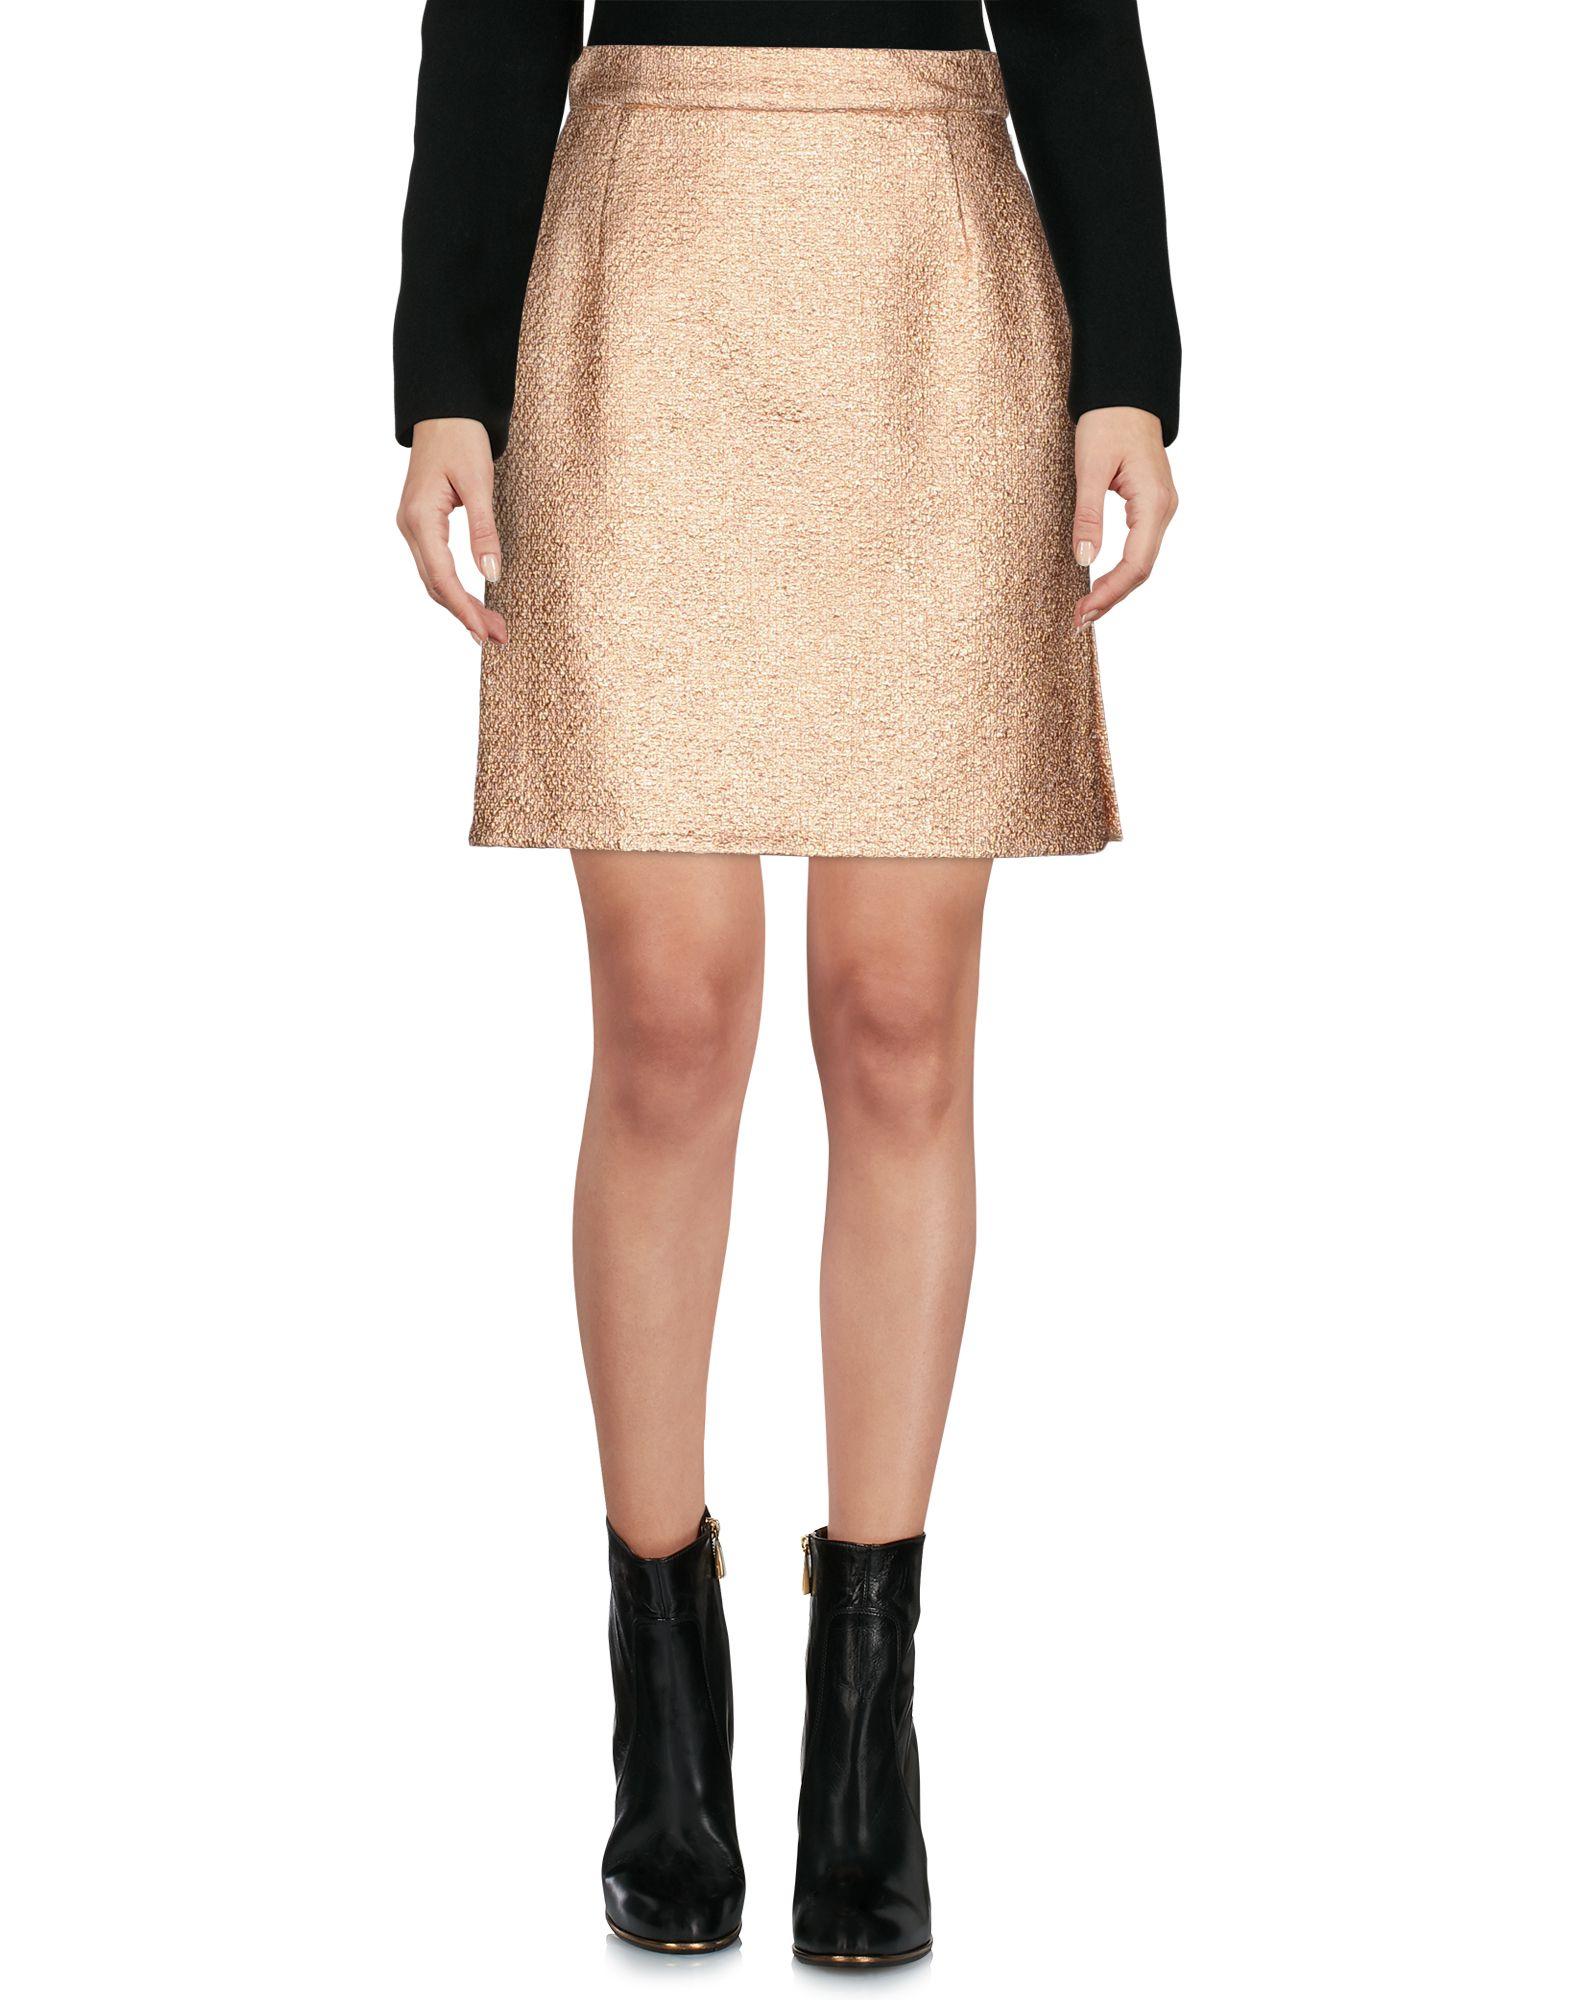 Minigonna Carven Donna - Acquista online su ViXLRB4Ql